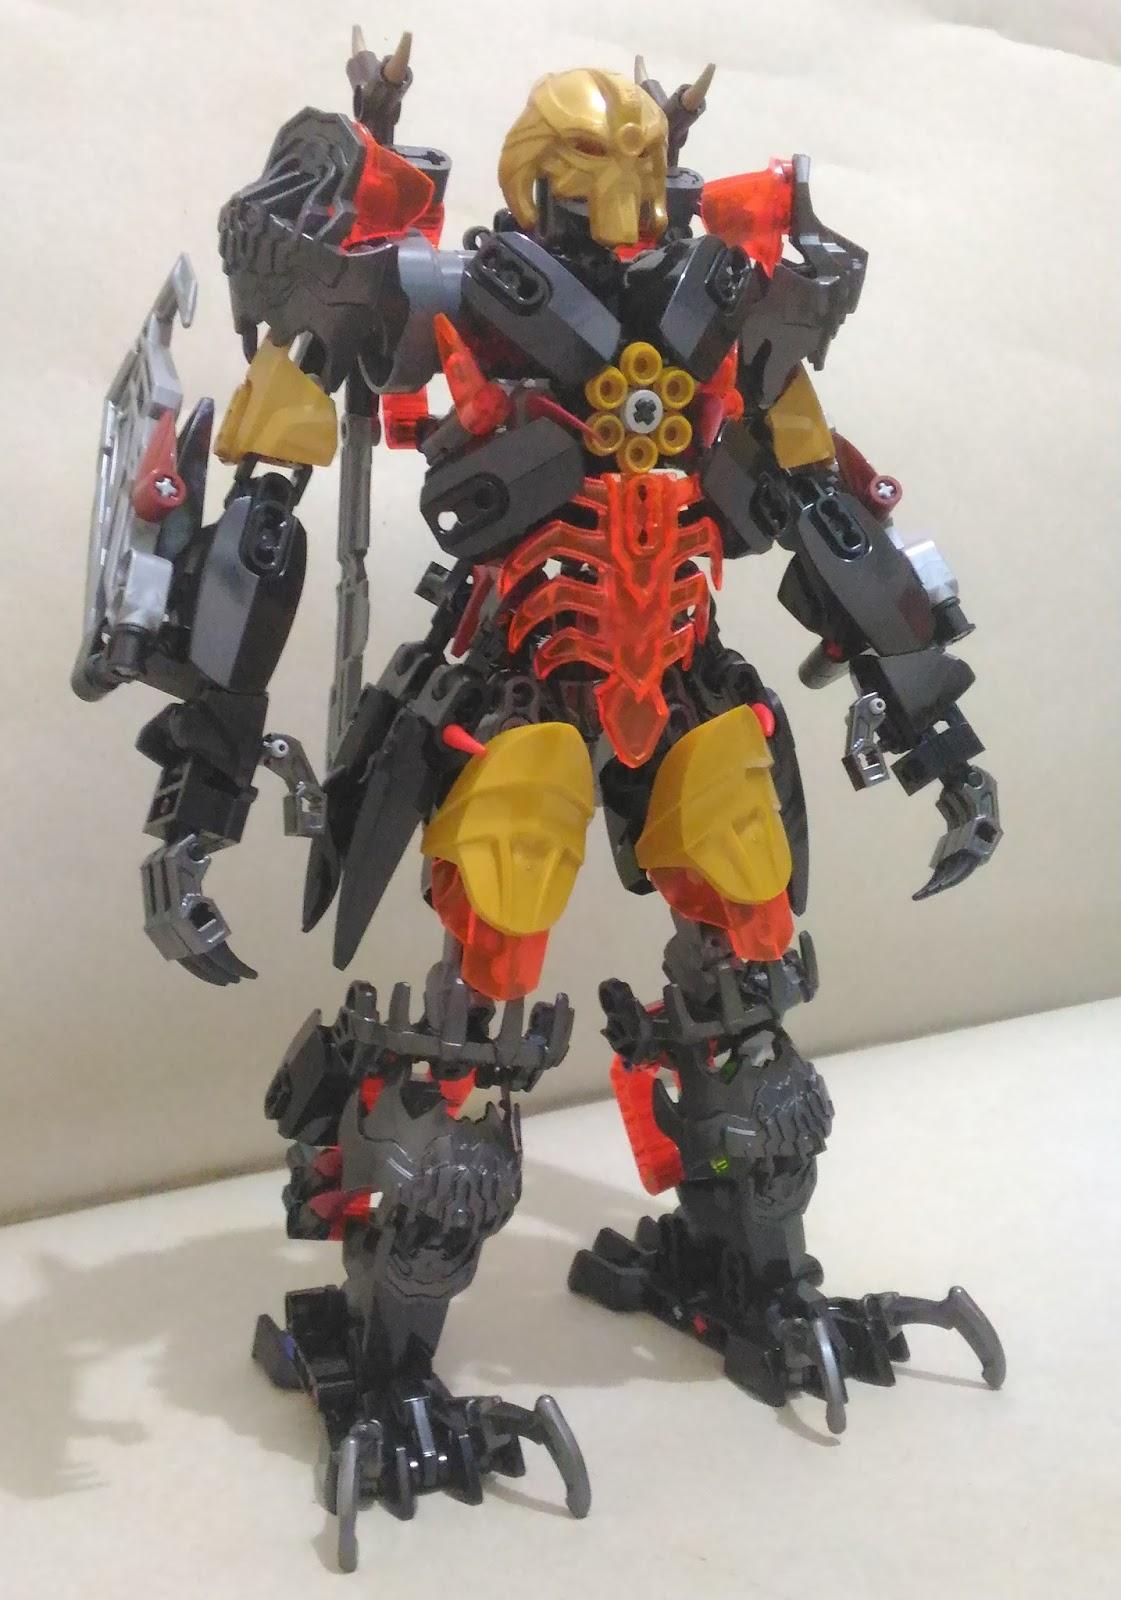 Лего Биониклы (Bionicle) - каталог наборов с инструкциями 45